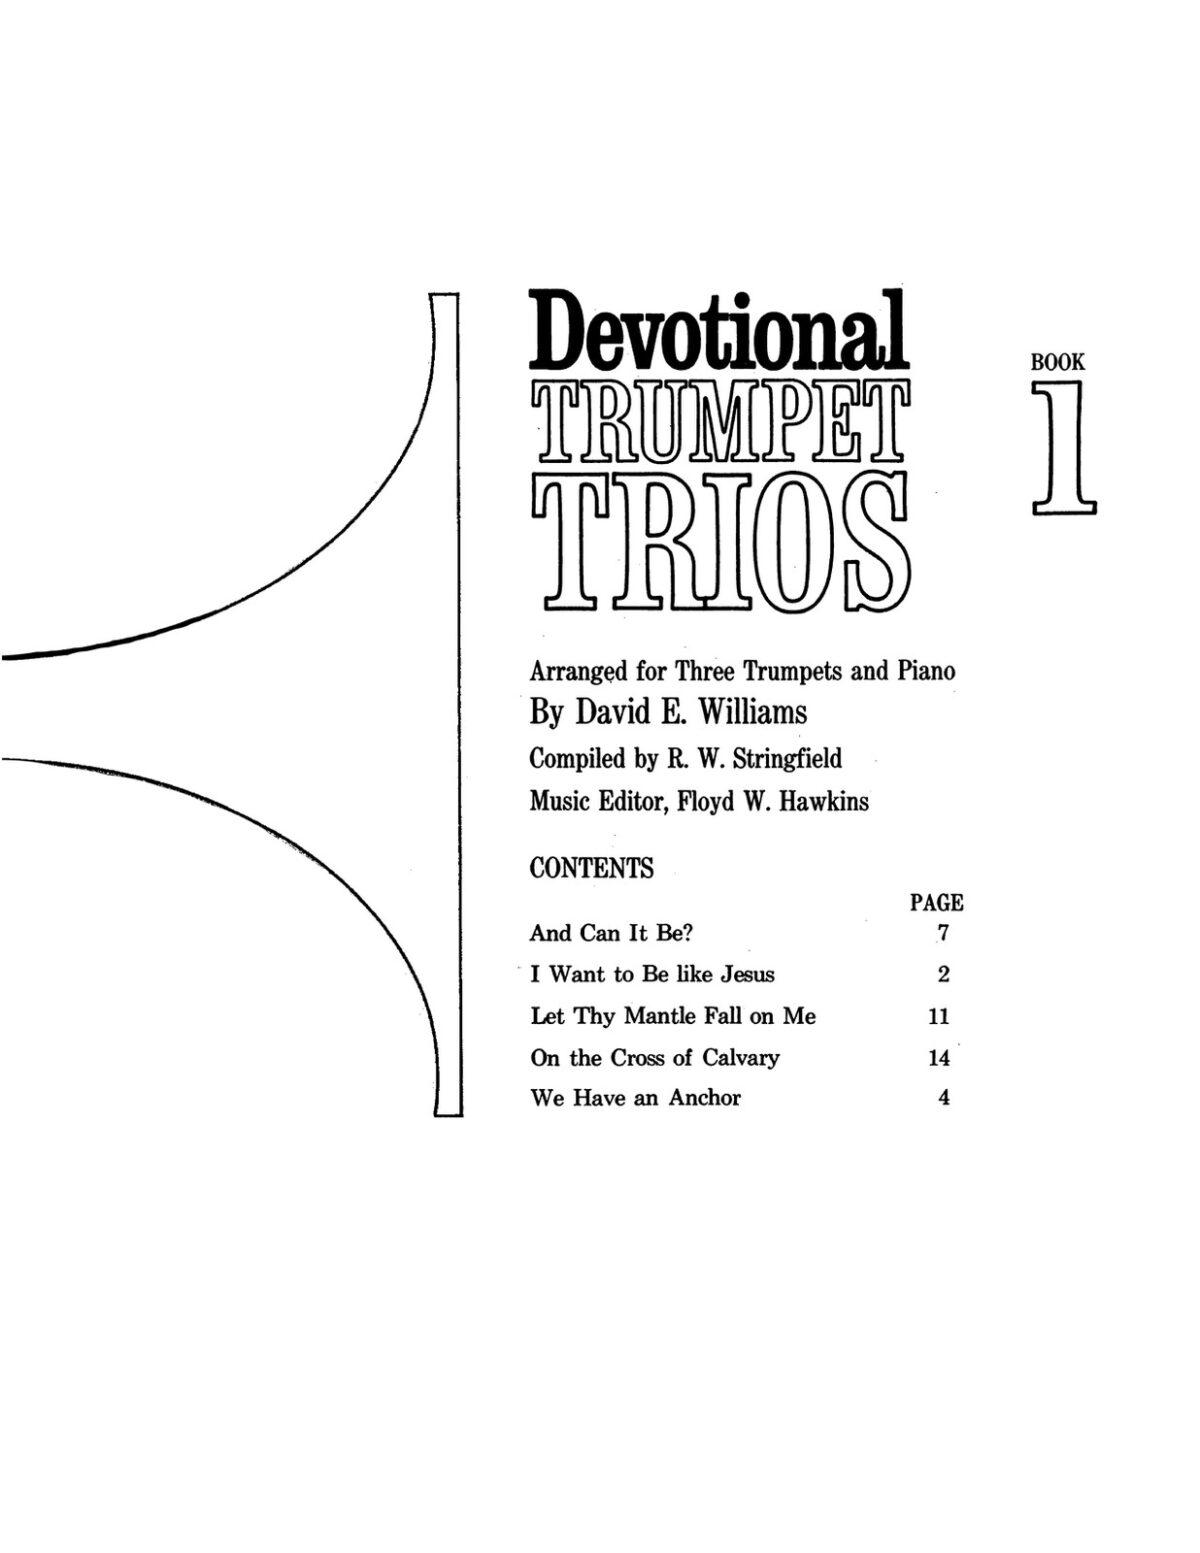 Williams, Devotional Trumpet Trios 1 (Parts & Score)-p03